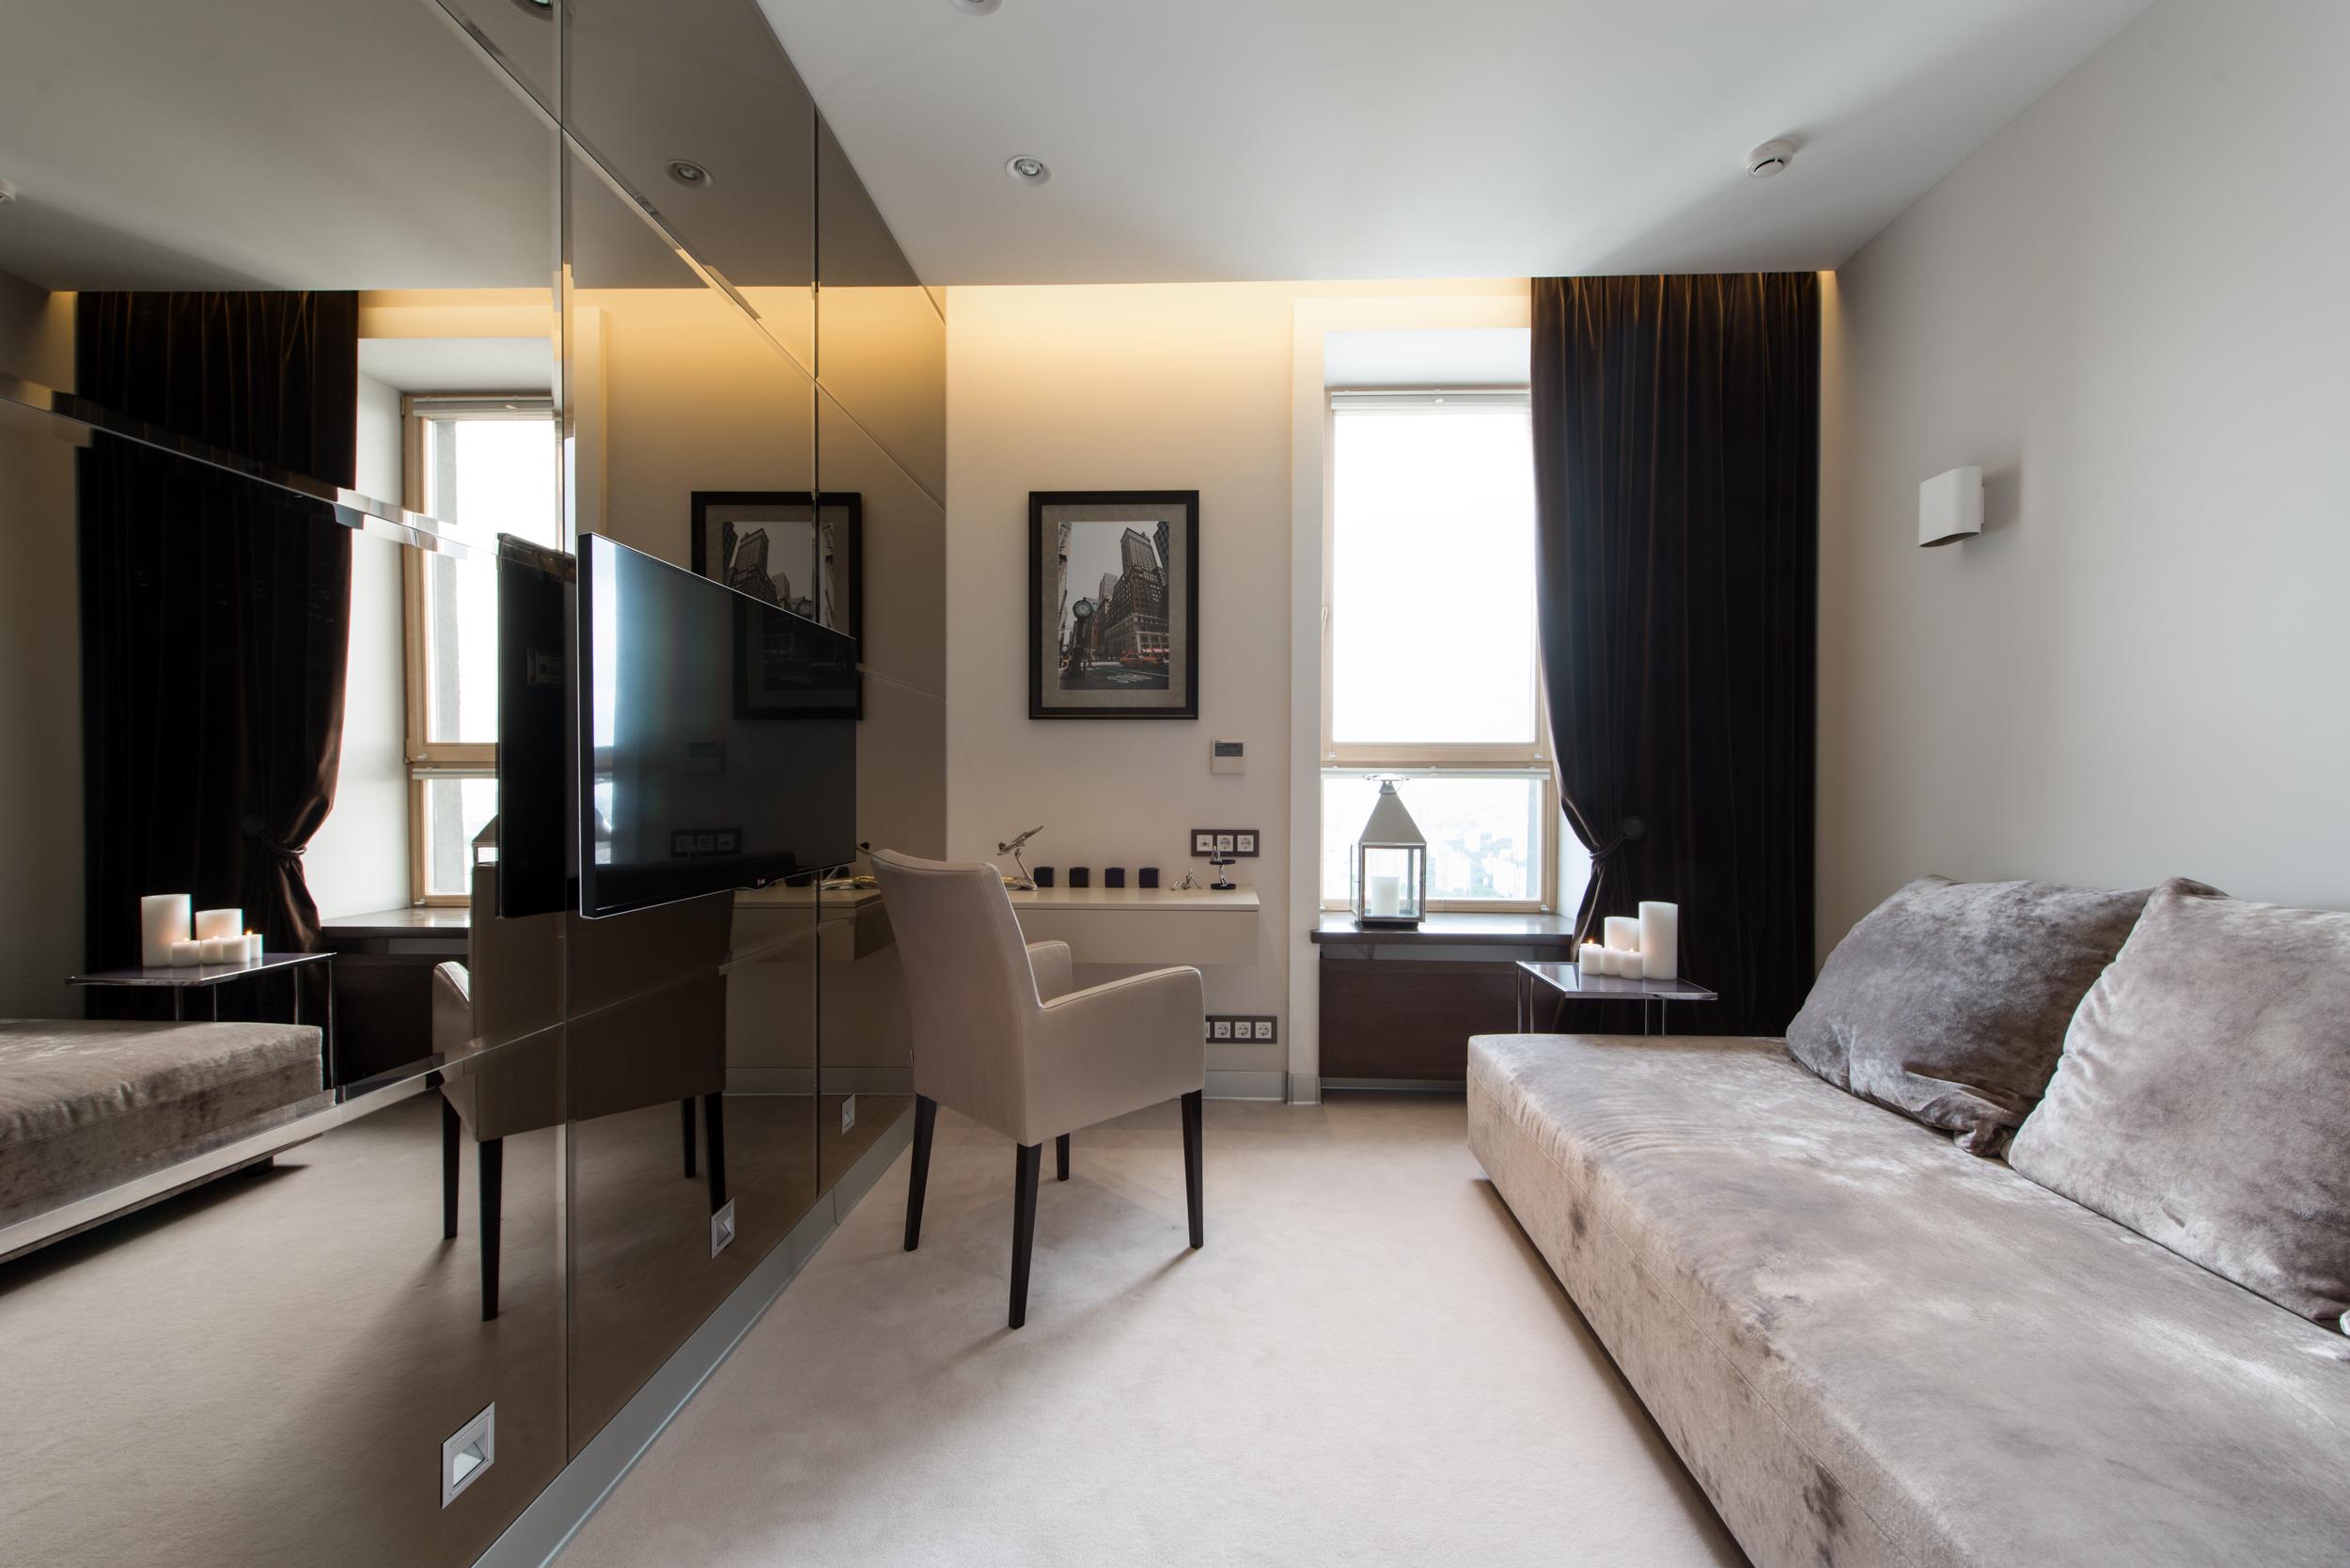 гостевая, зеркальная стена, диван